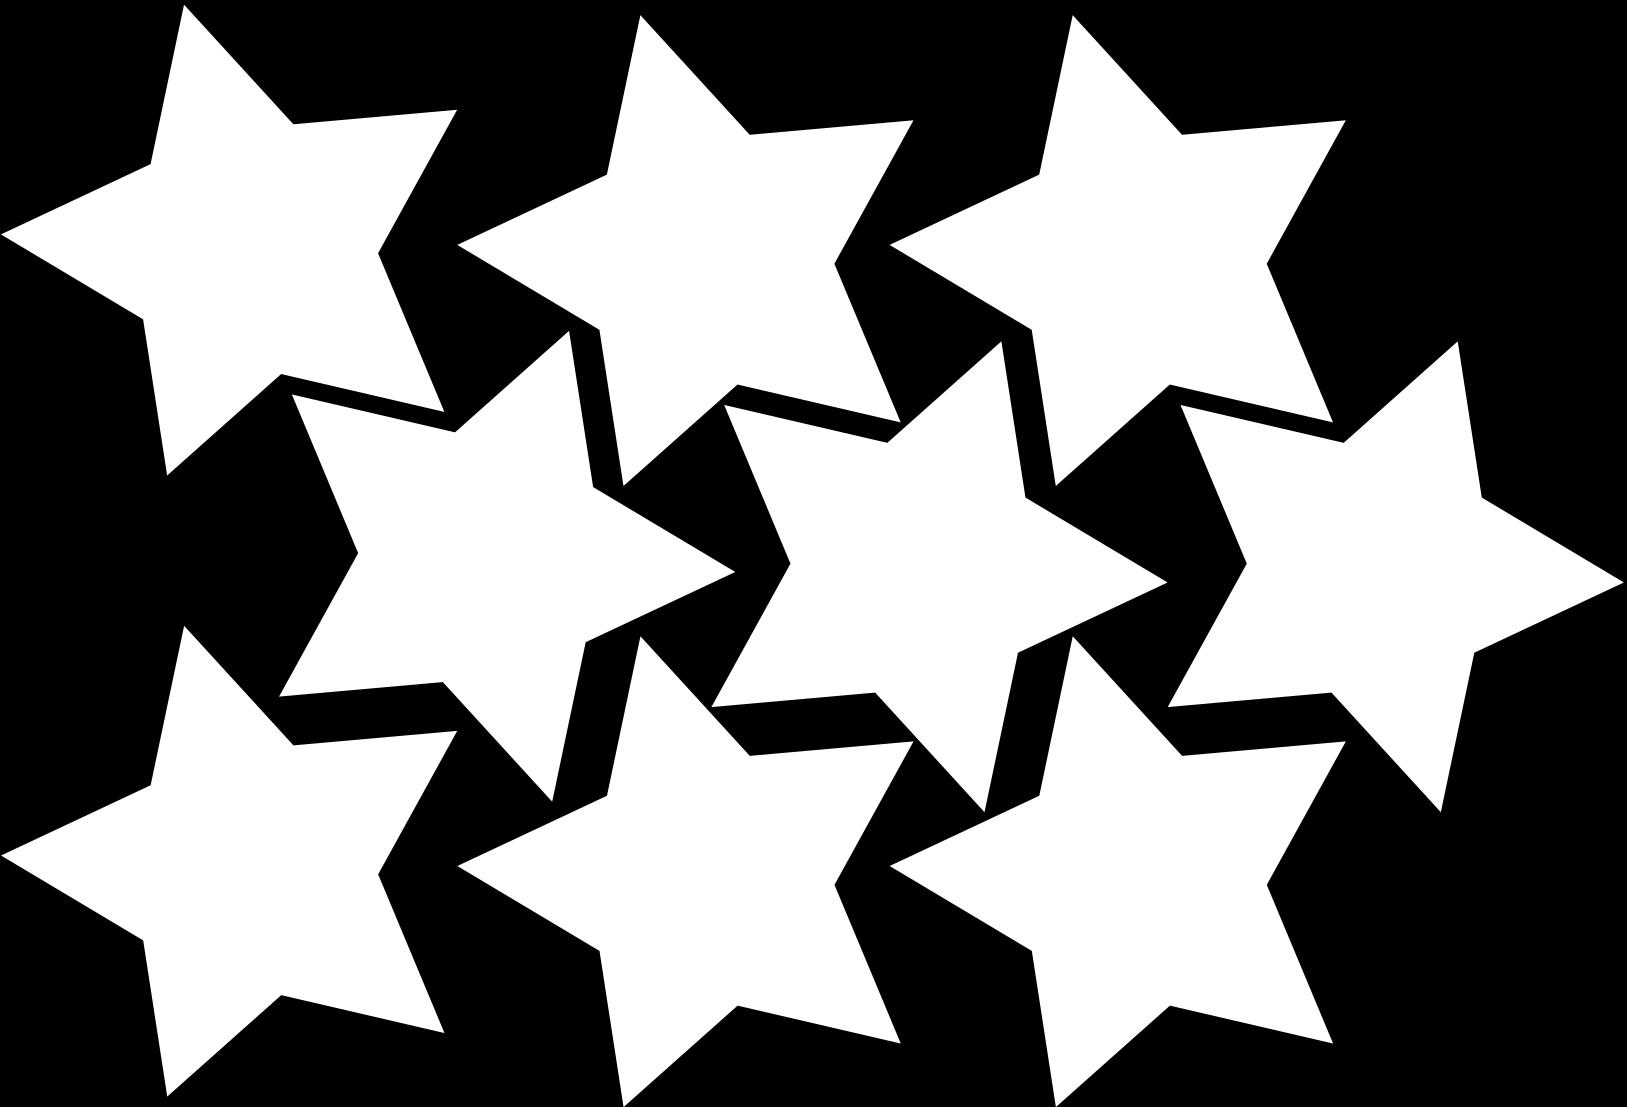 Transparent black stars clipart - Magical Clipart Hollywood Star - Star Garland Printable